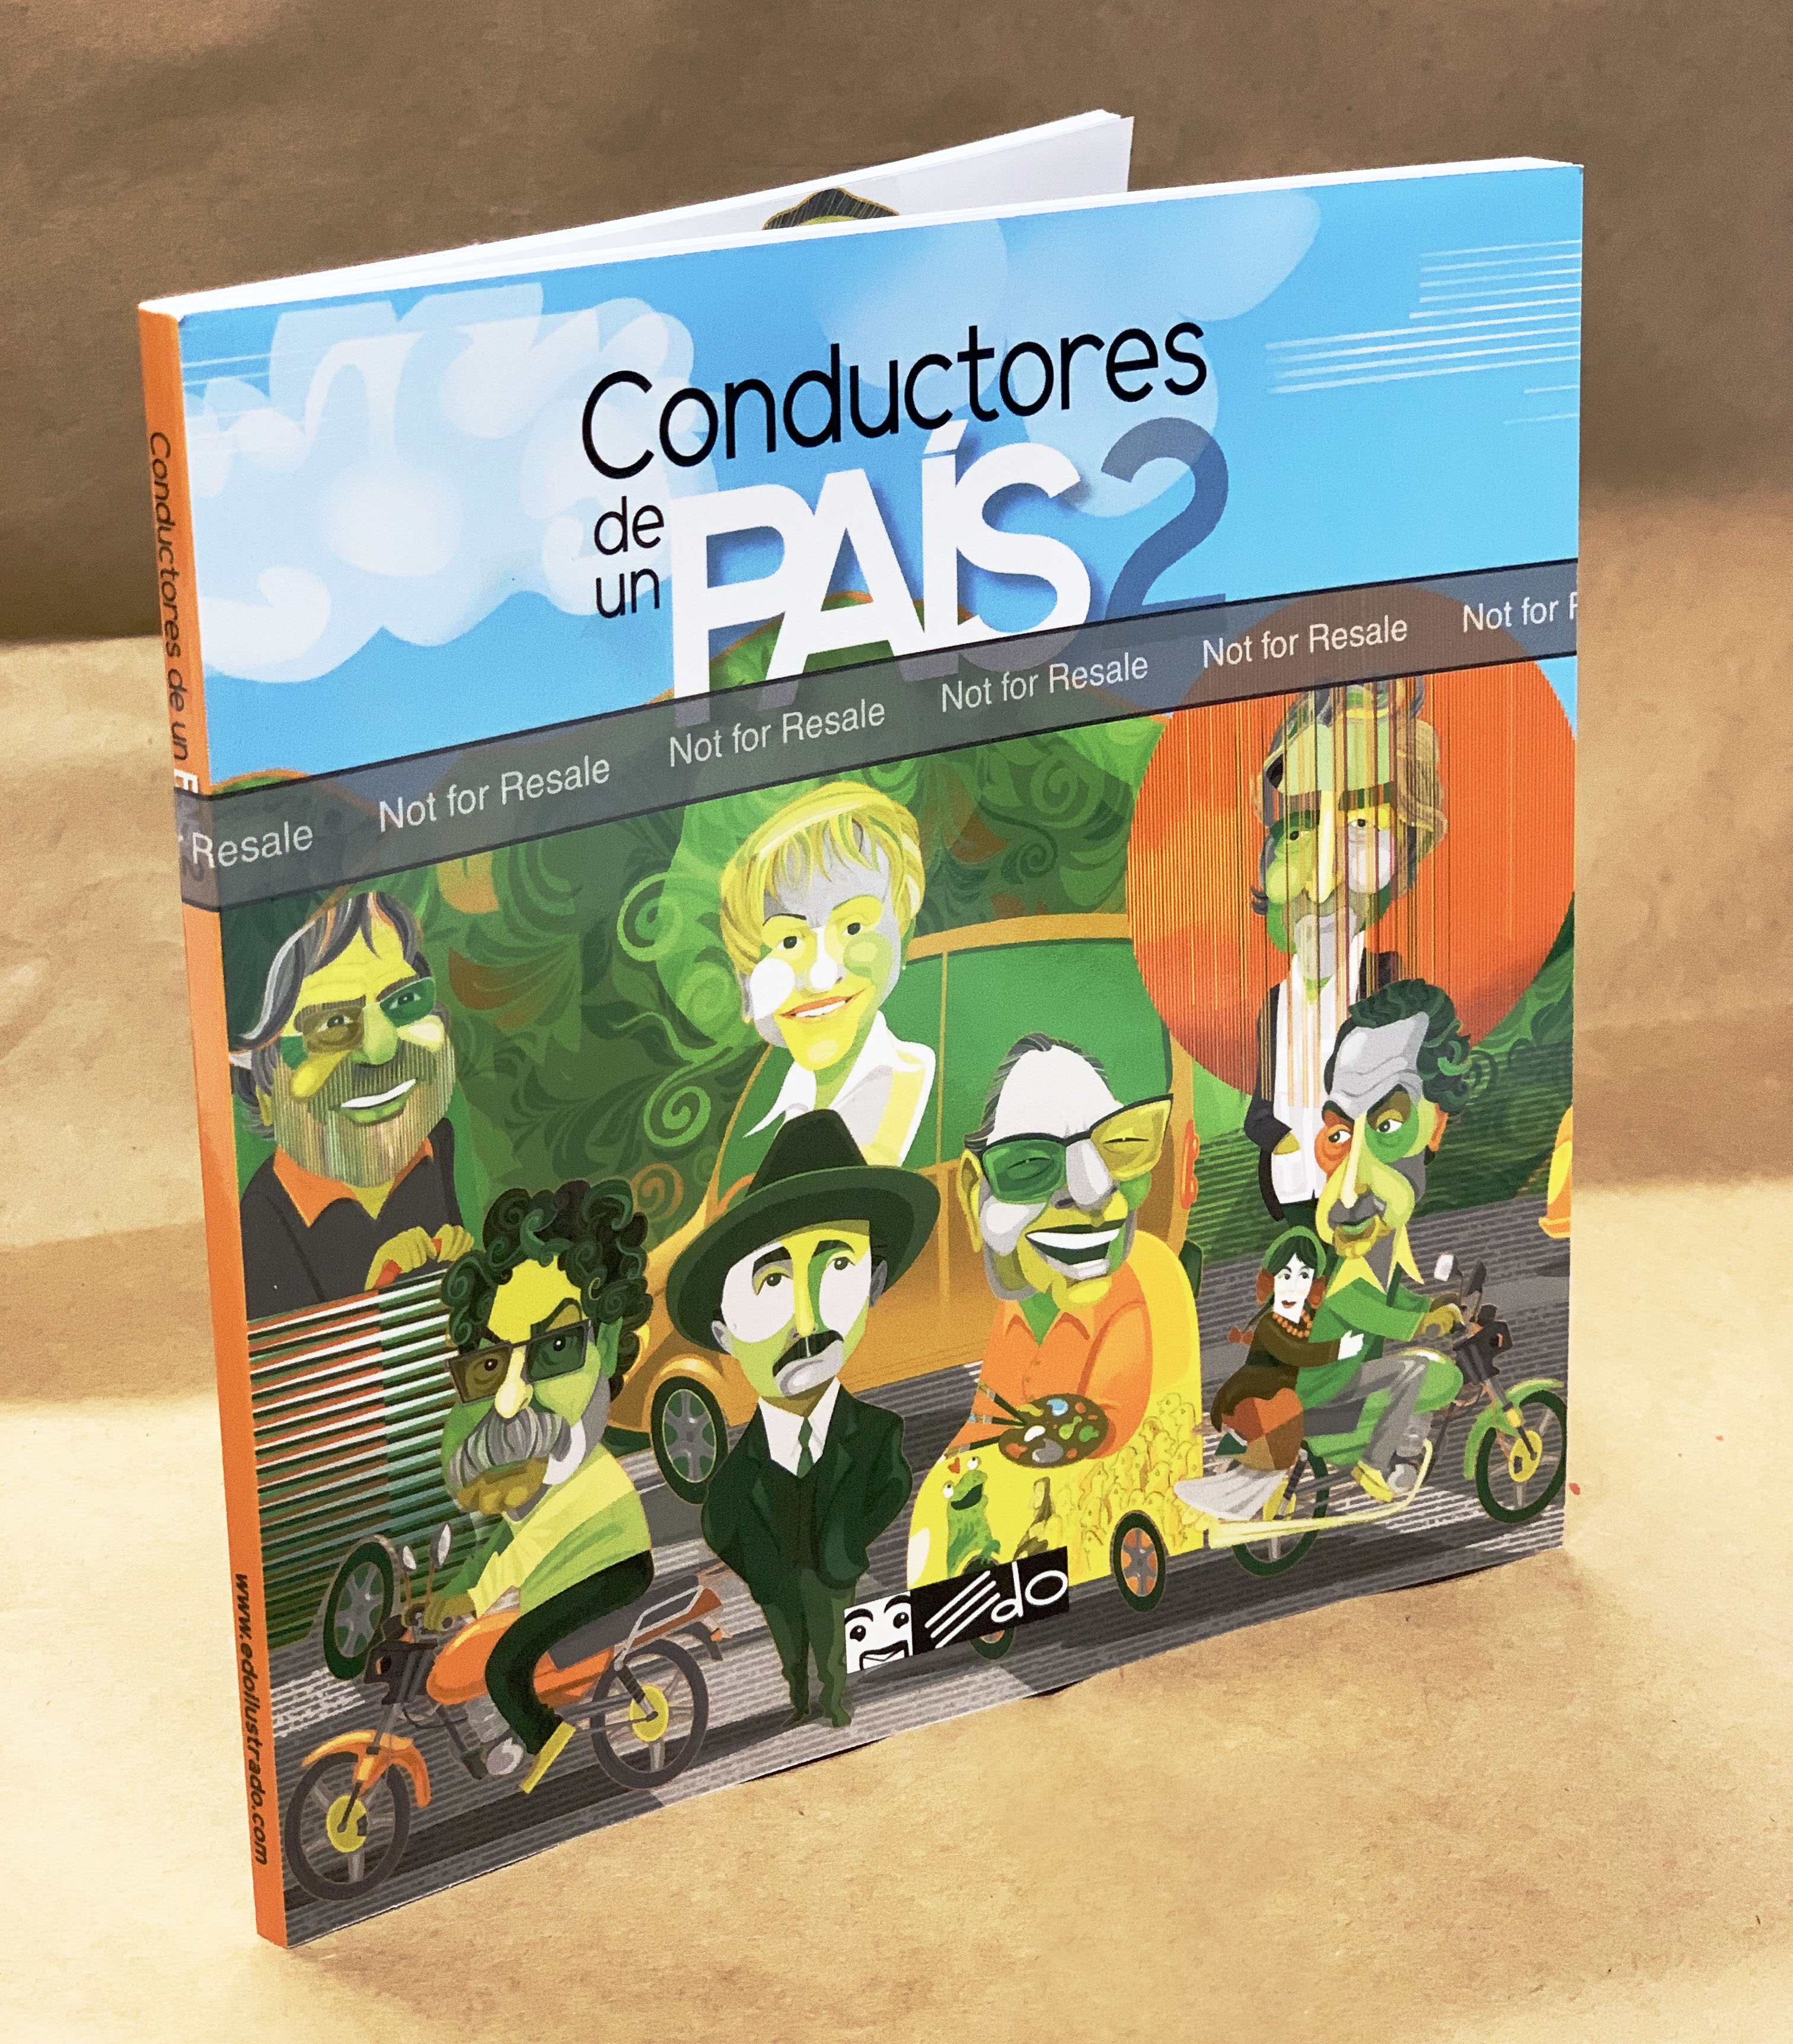 CATALOGO Conductores de un país